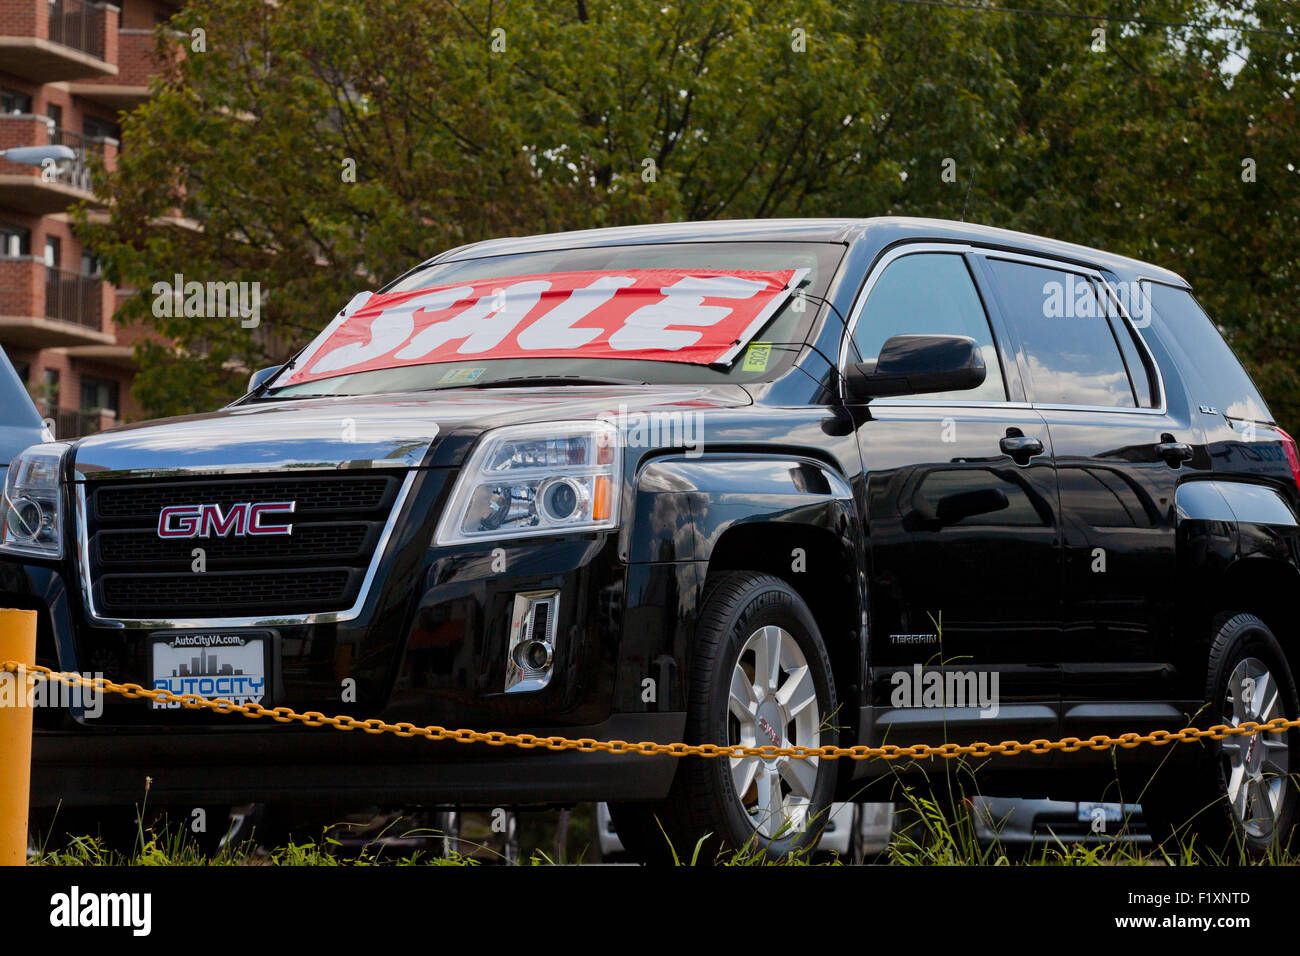 inventory auto used yukon cars sale suv gmc loftus city taunton for